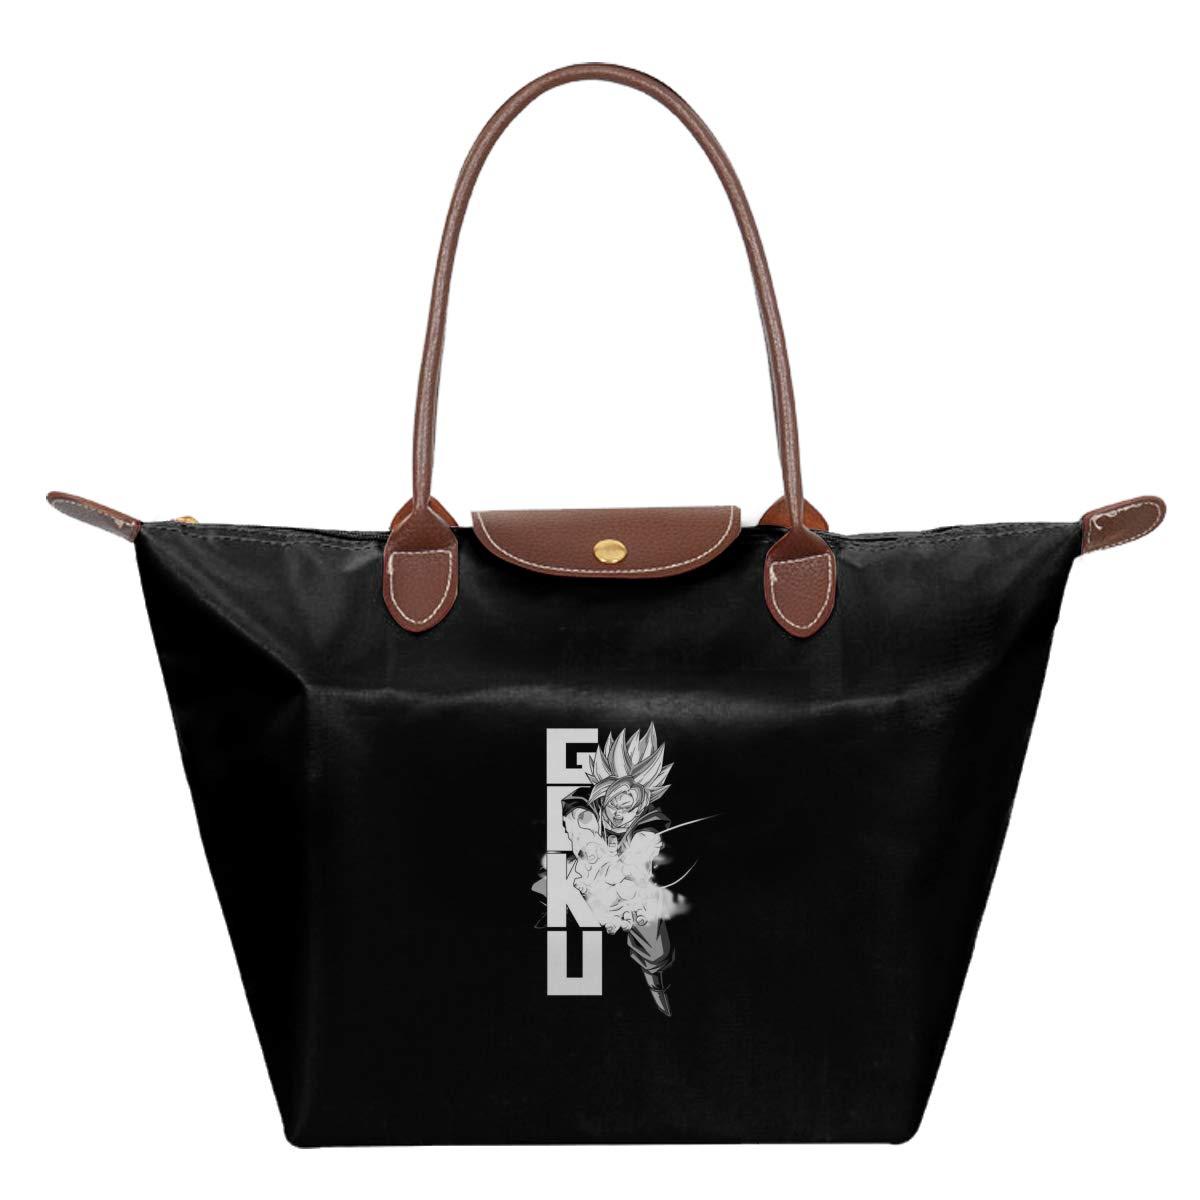 Dragon Ball Z Goku White Saiyan Waterproof Leather Folded Messenger Nylon Bag Travel Tote Hopping Folding School Handbags